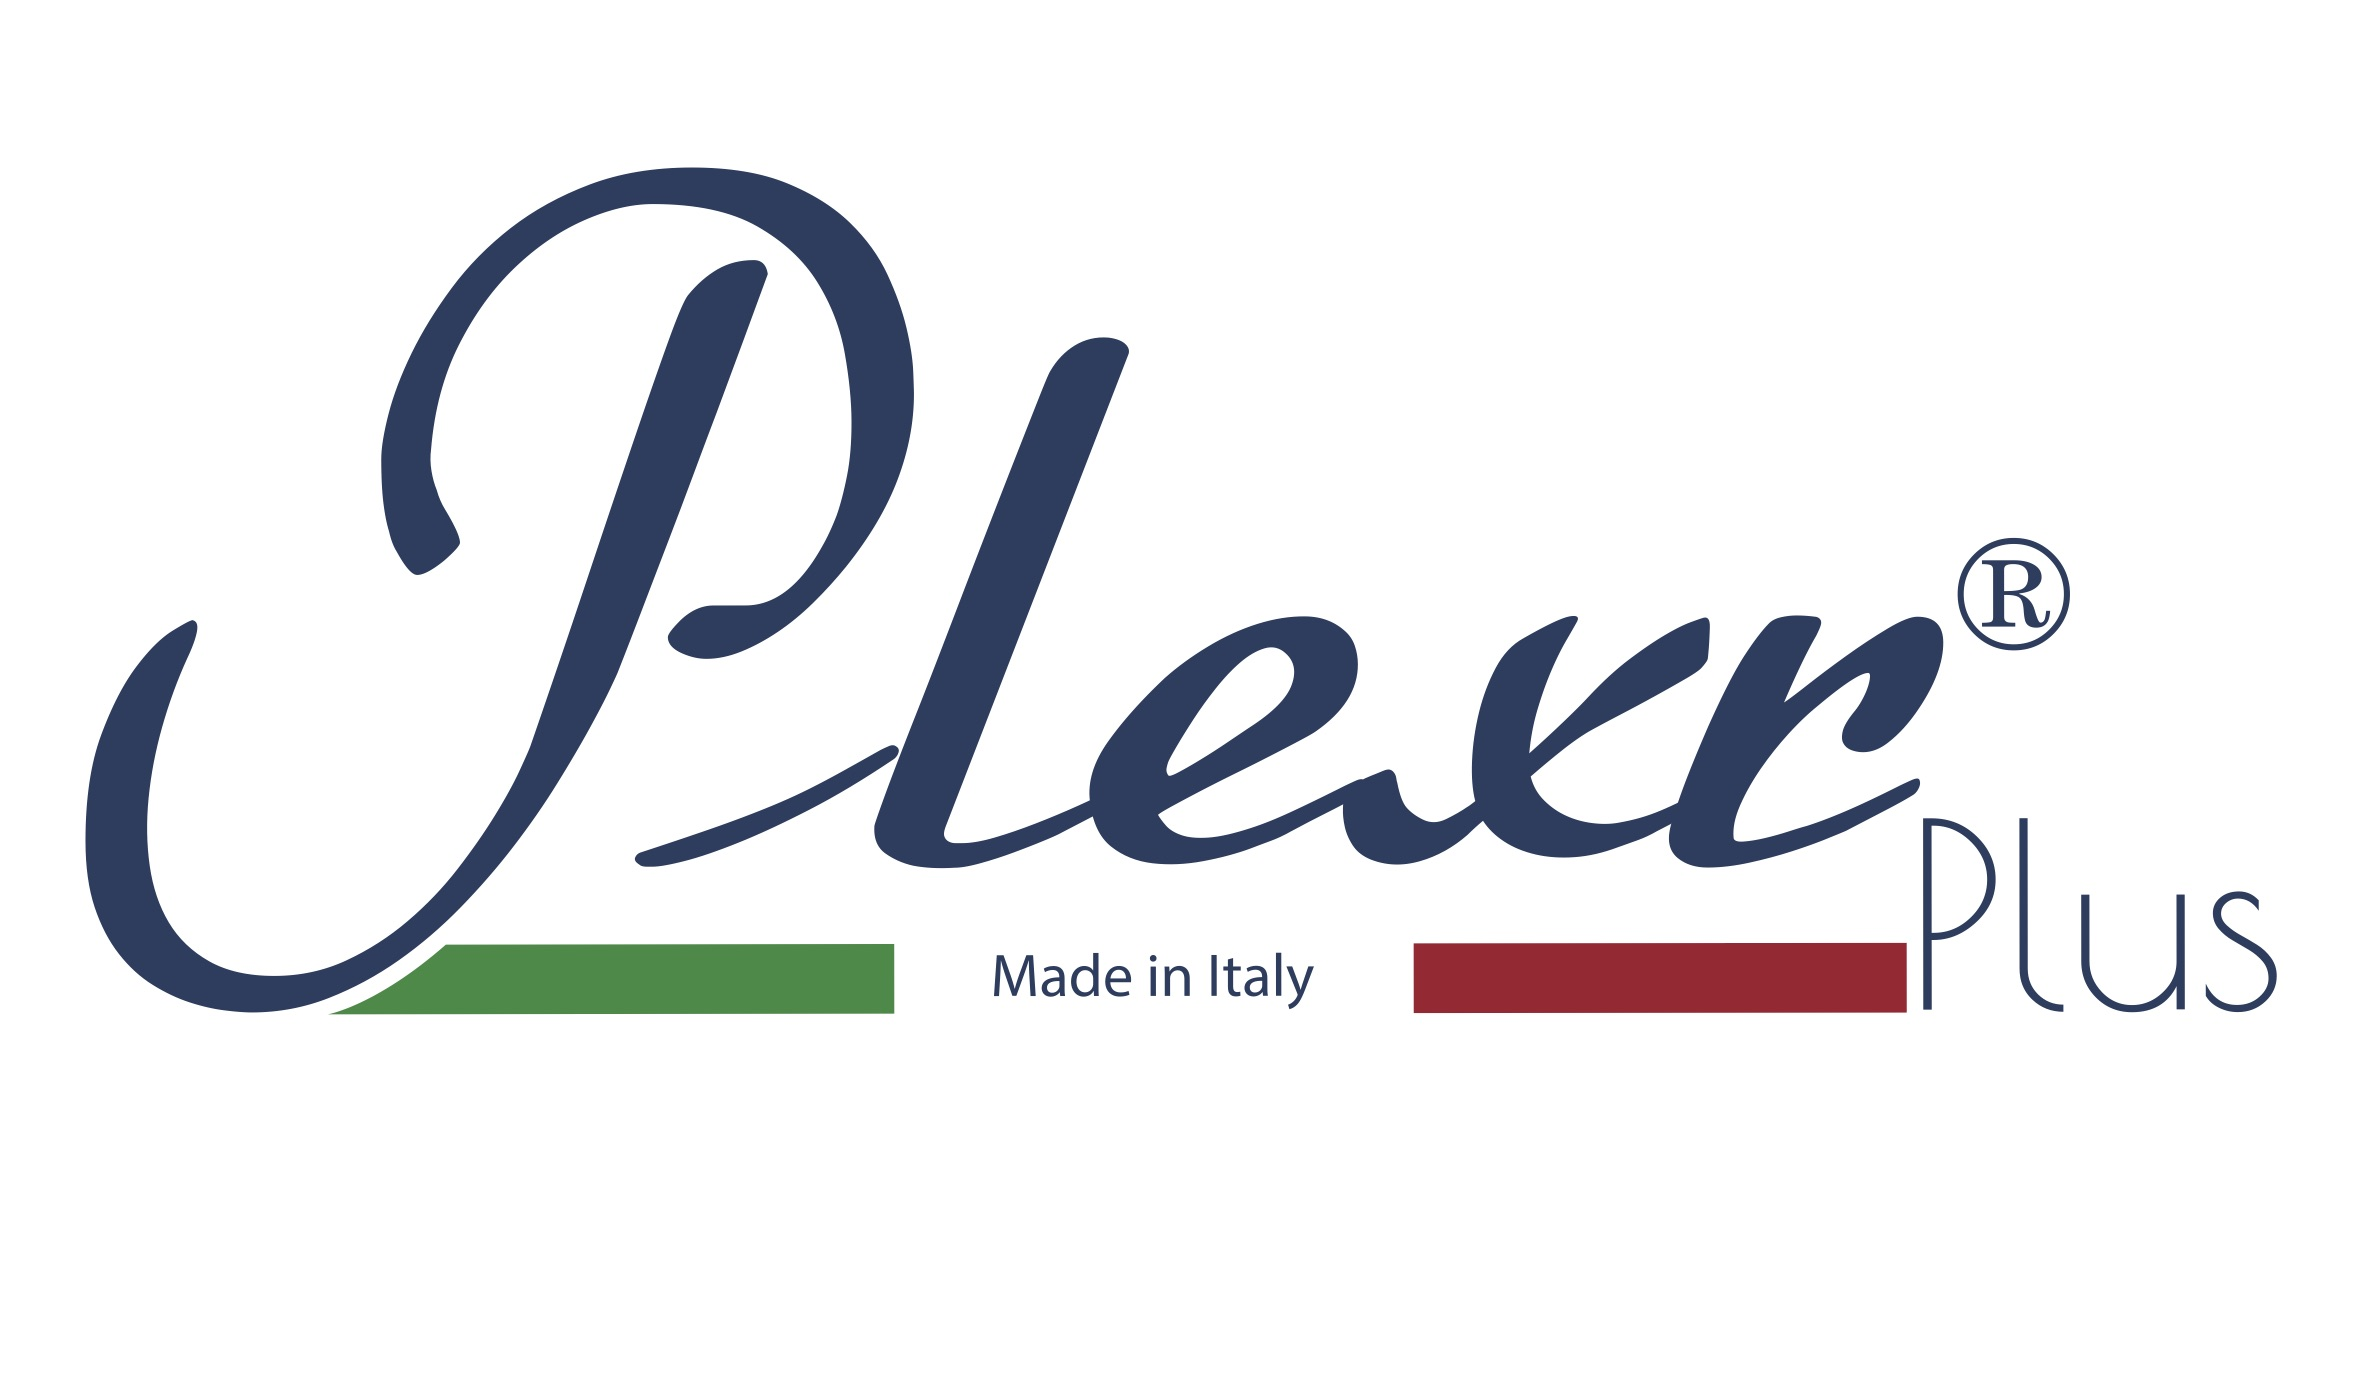 Plexr%20Plus%20Logo.jpg